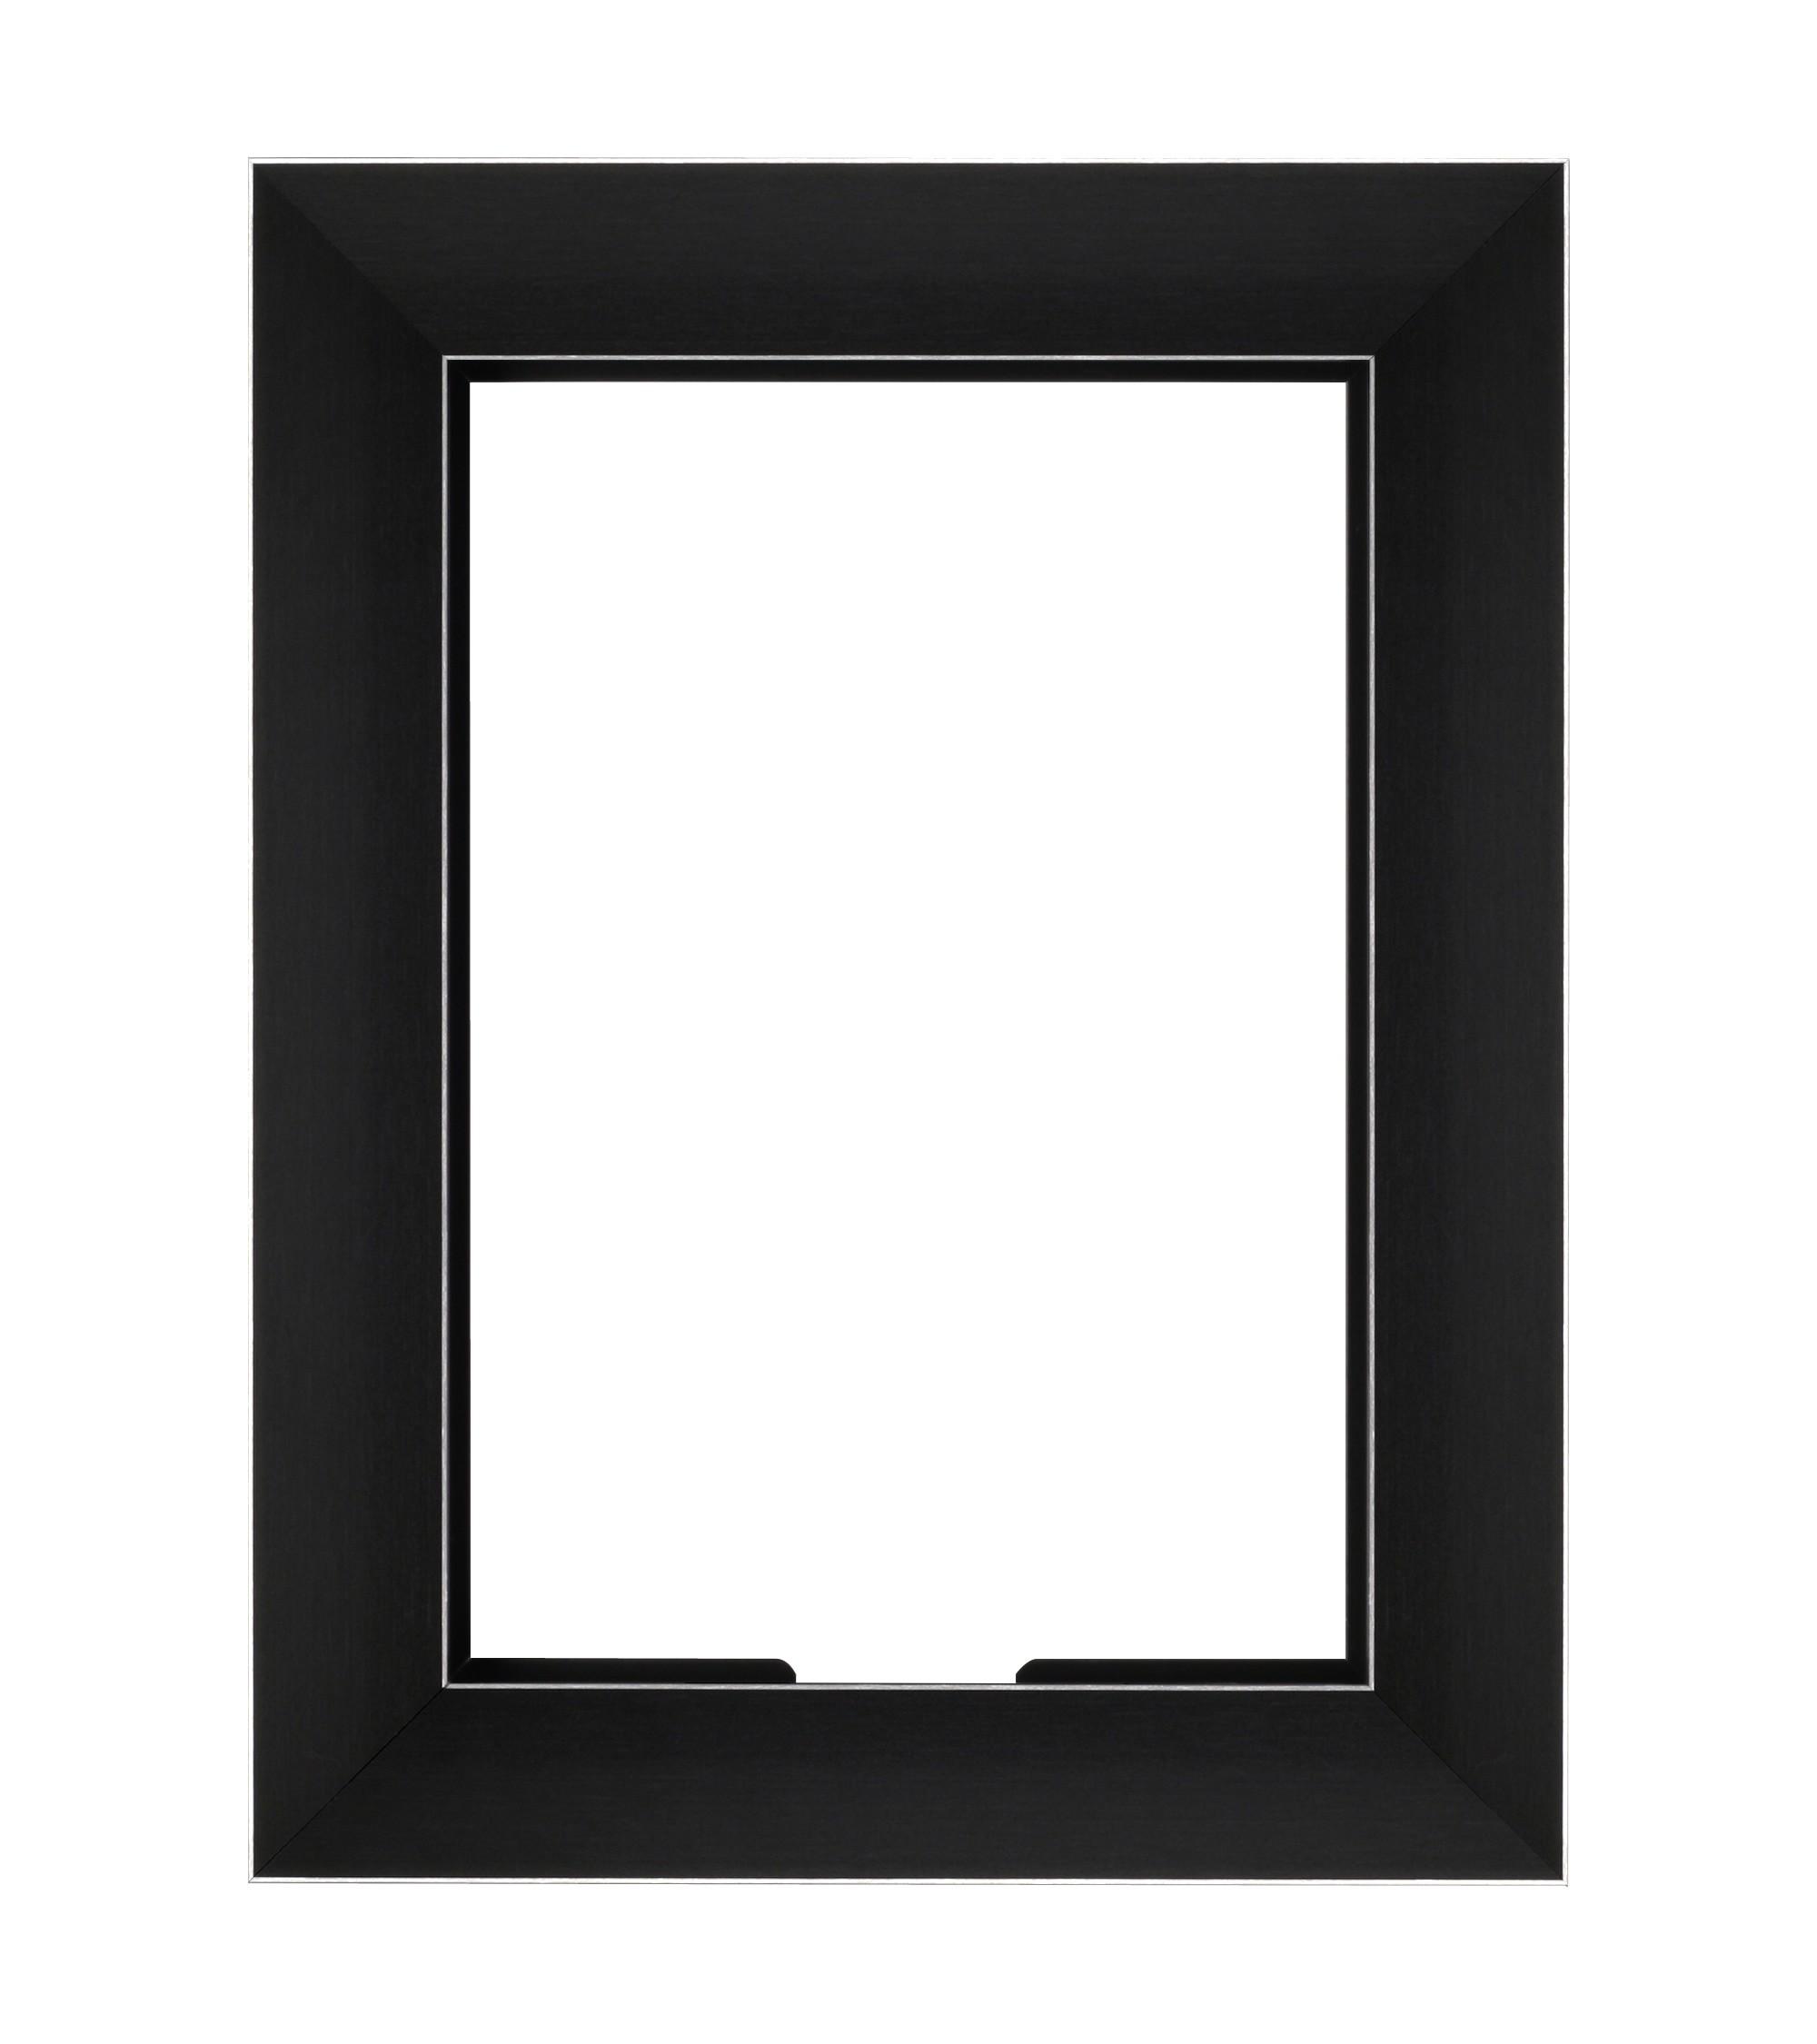 Vidamount ipad metal on wall frameenclosure vidamount ipad metal wall frame mount front view no ipad jeuxipadfo Image collections